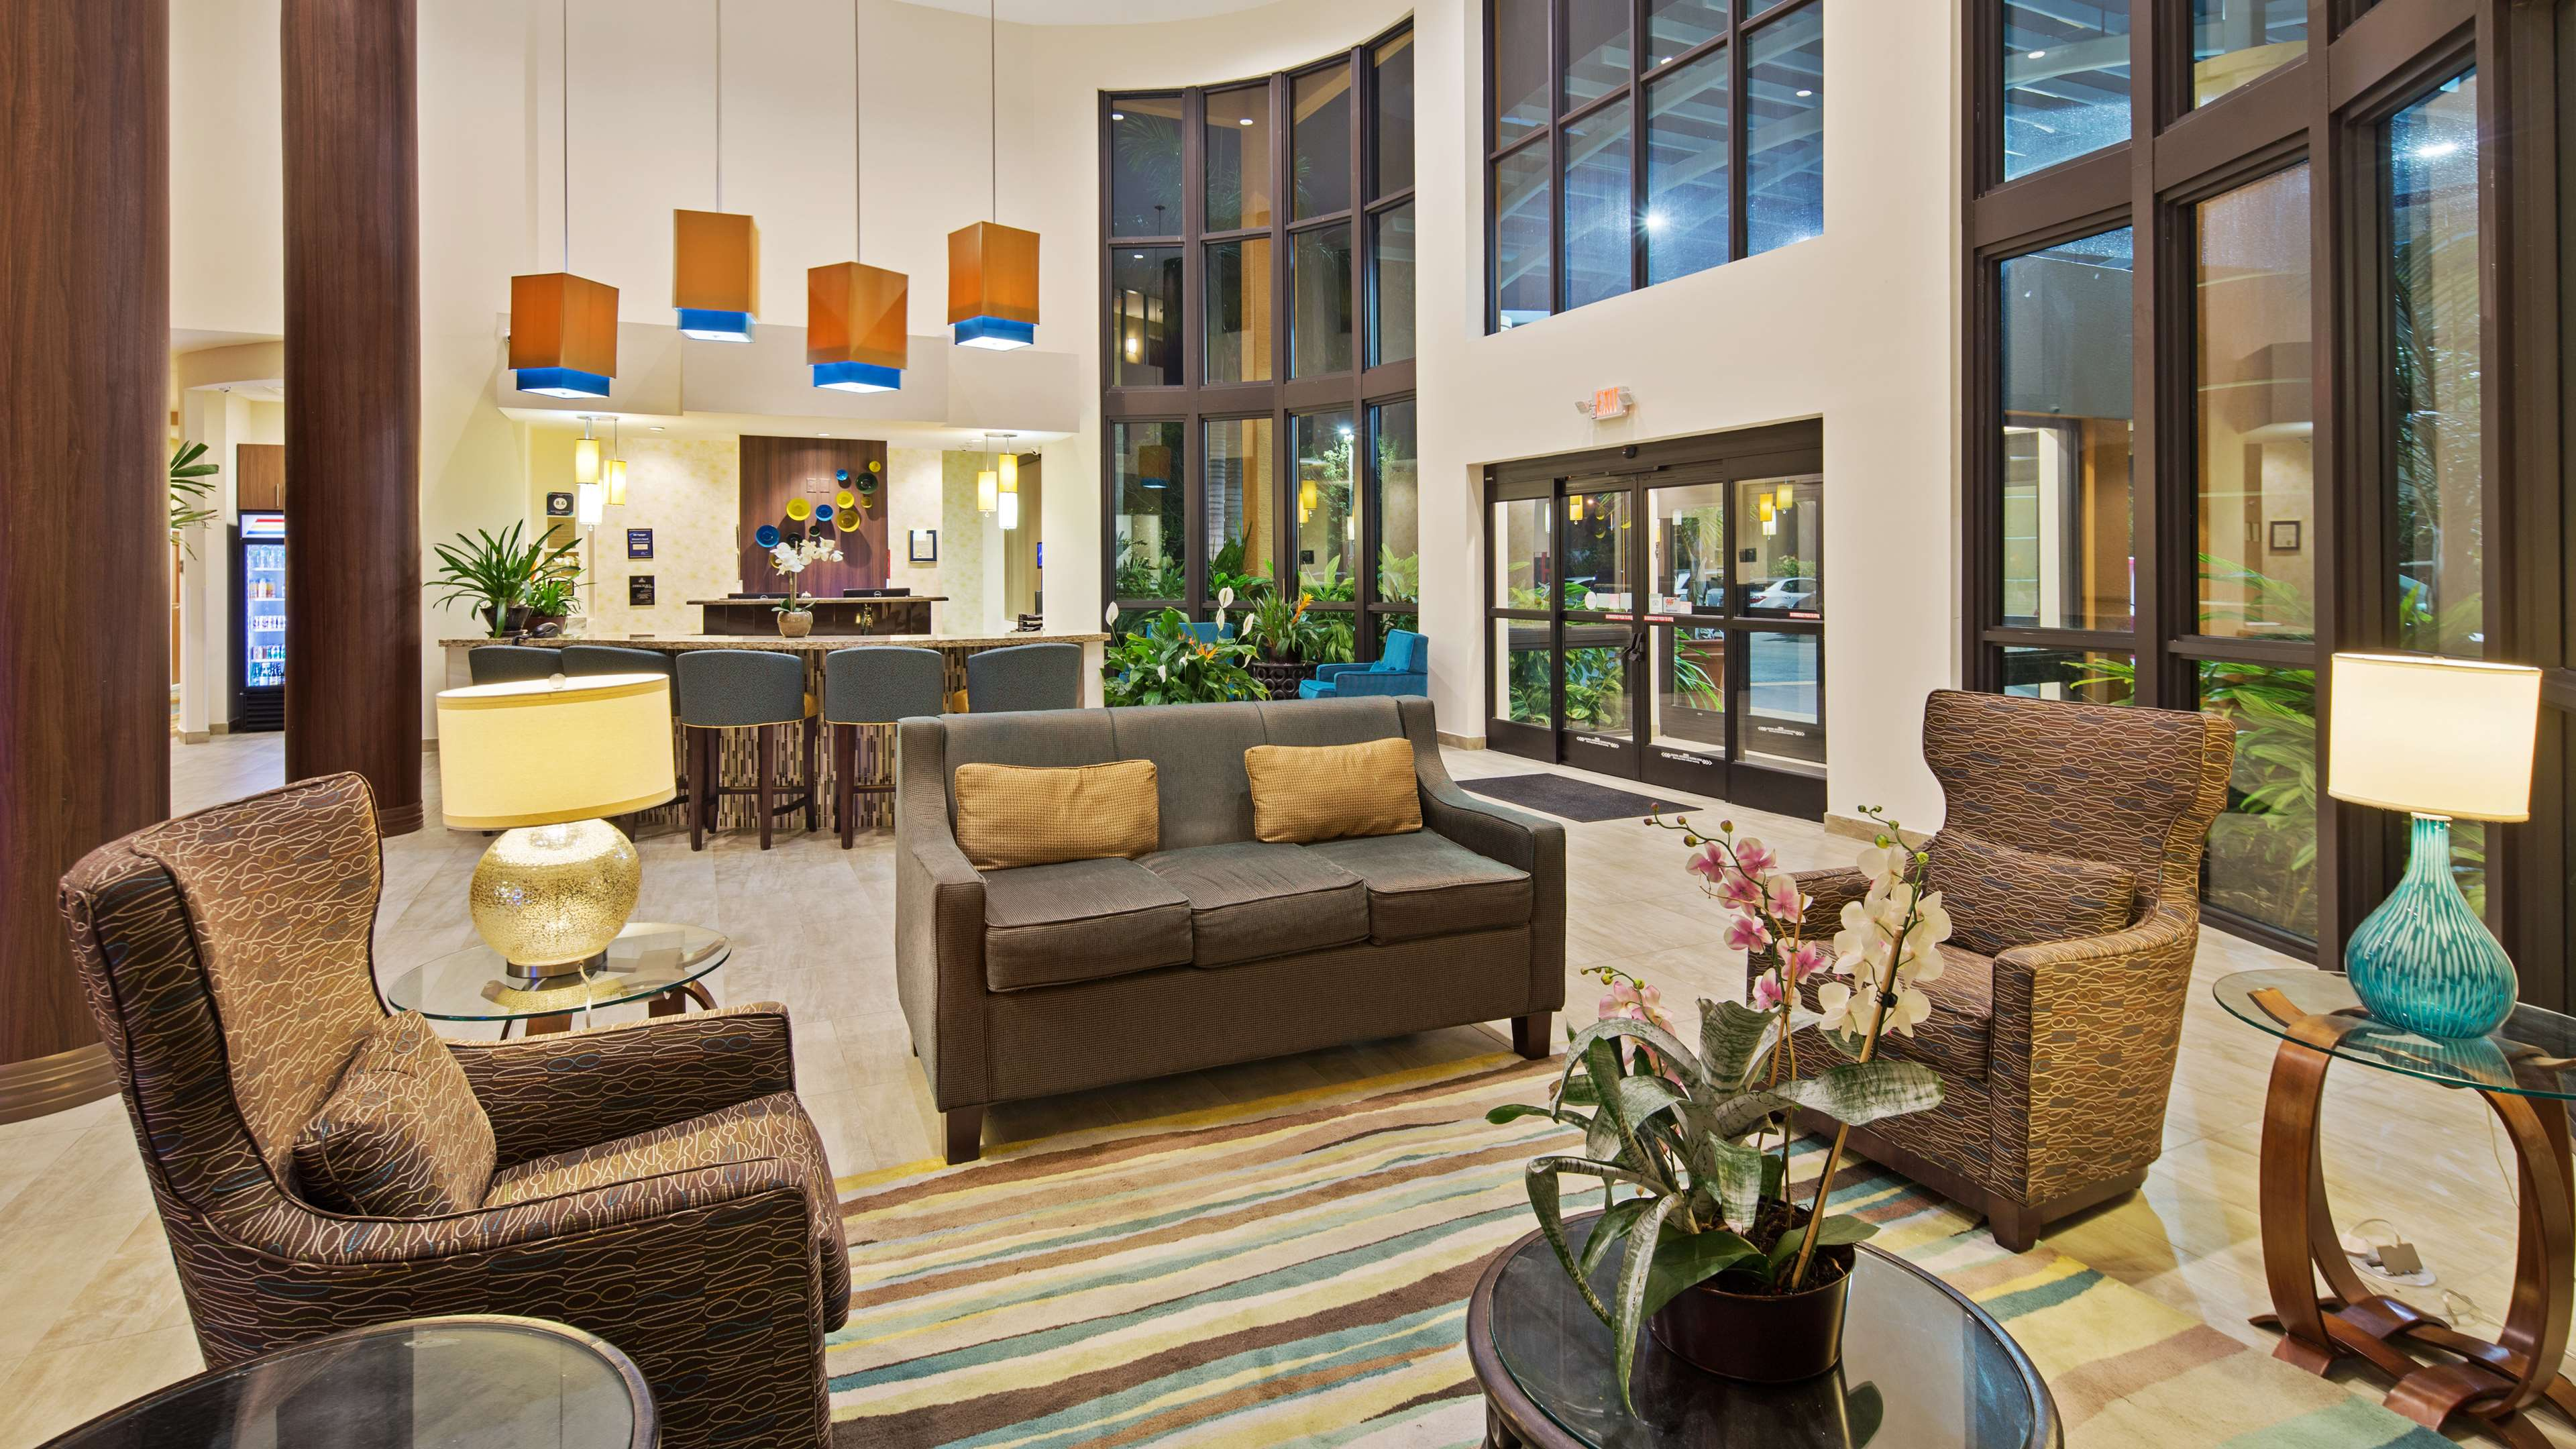 Best Western Plus Kendall Airport Hotel & Suites image 2